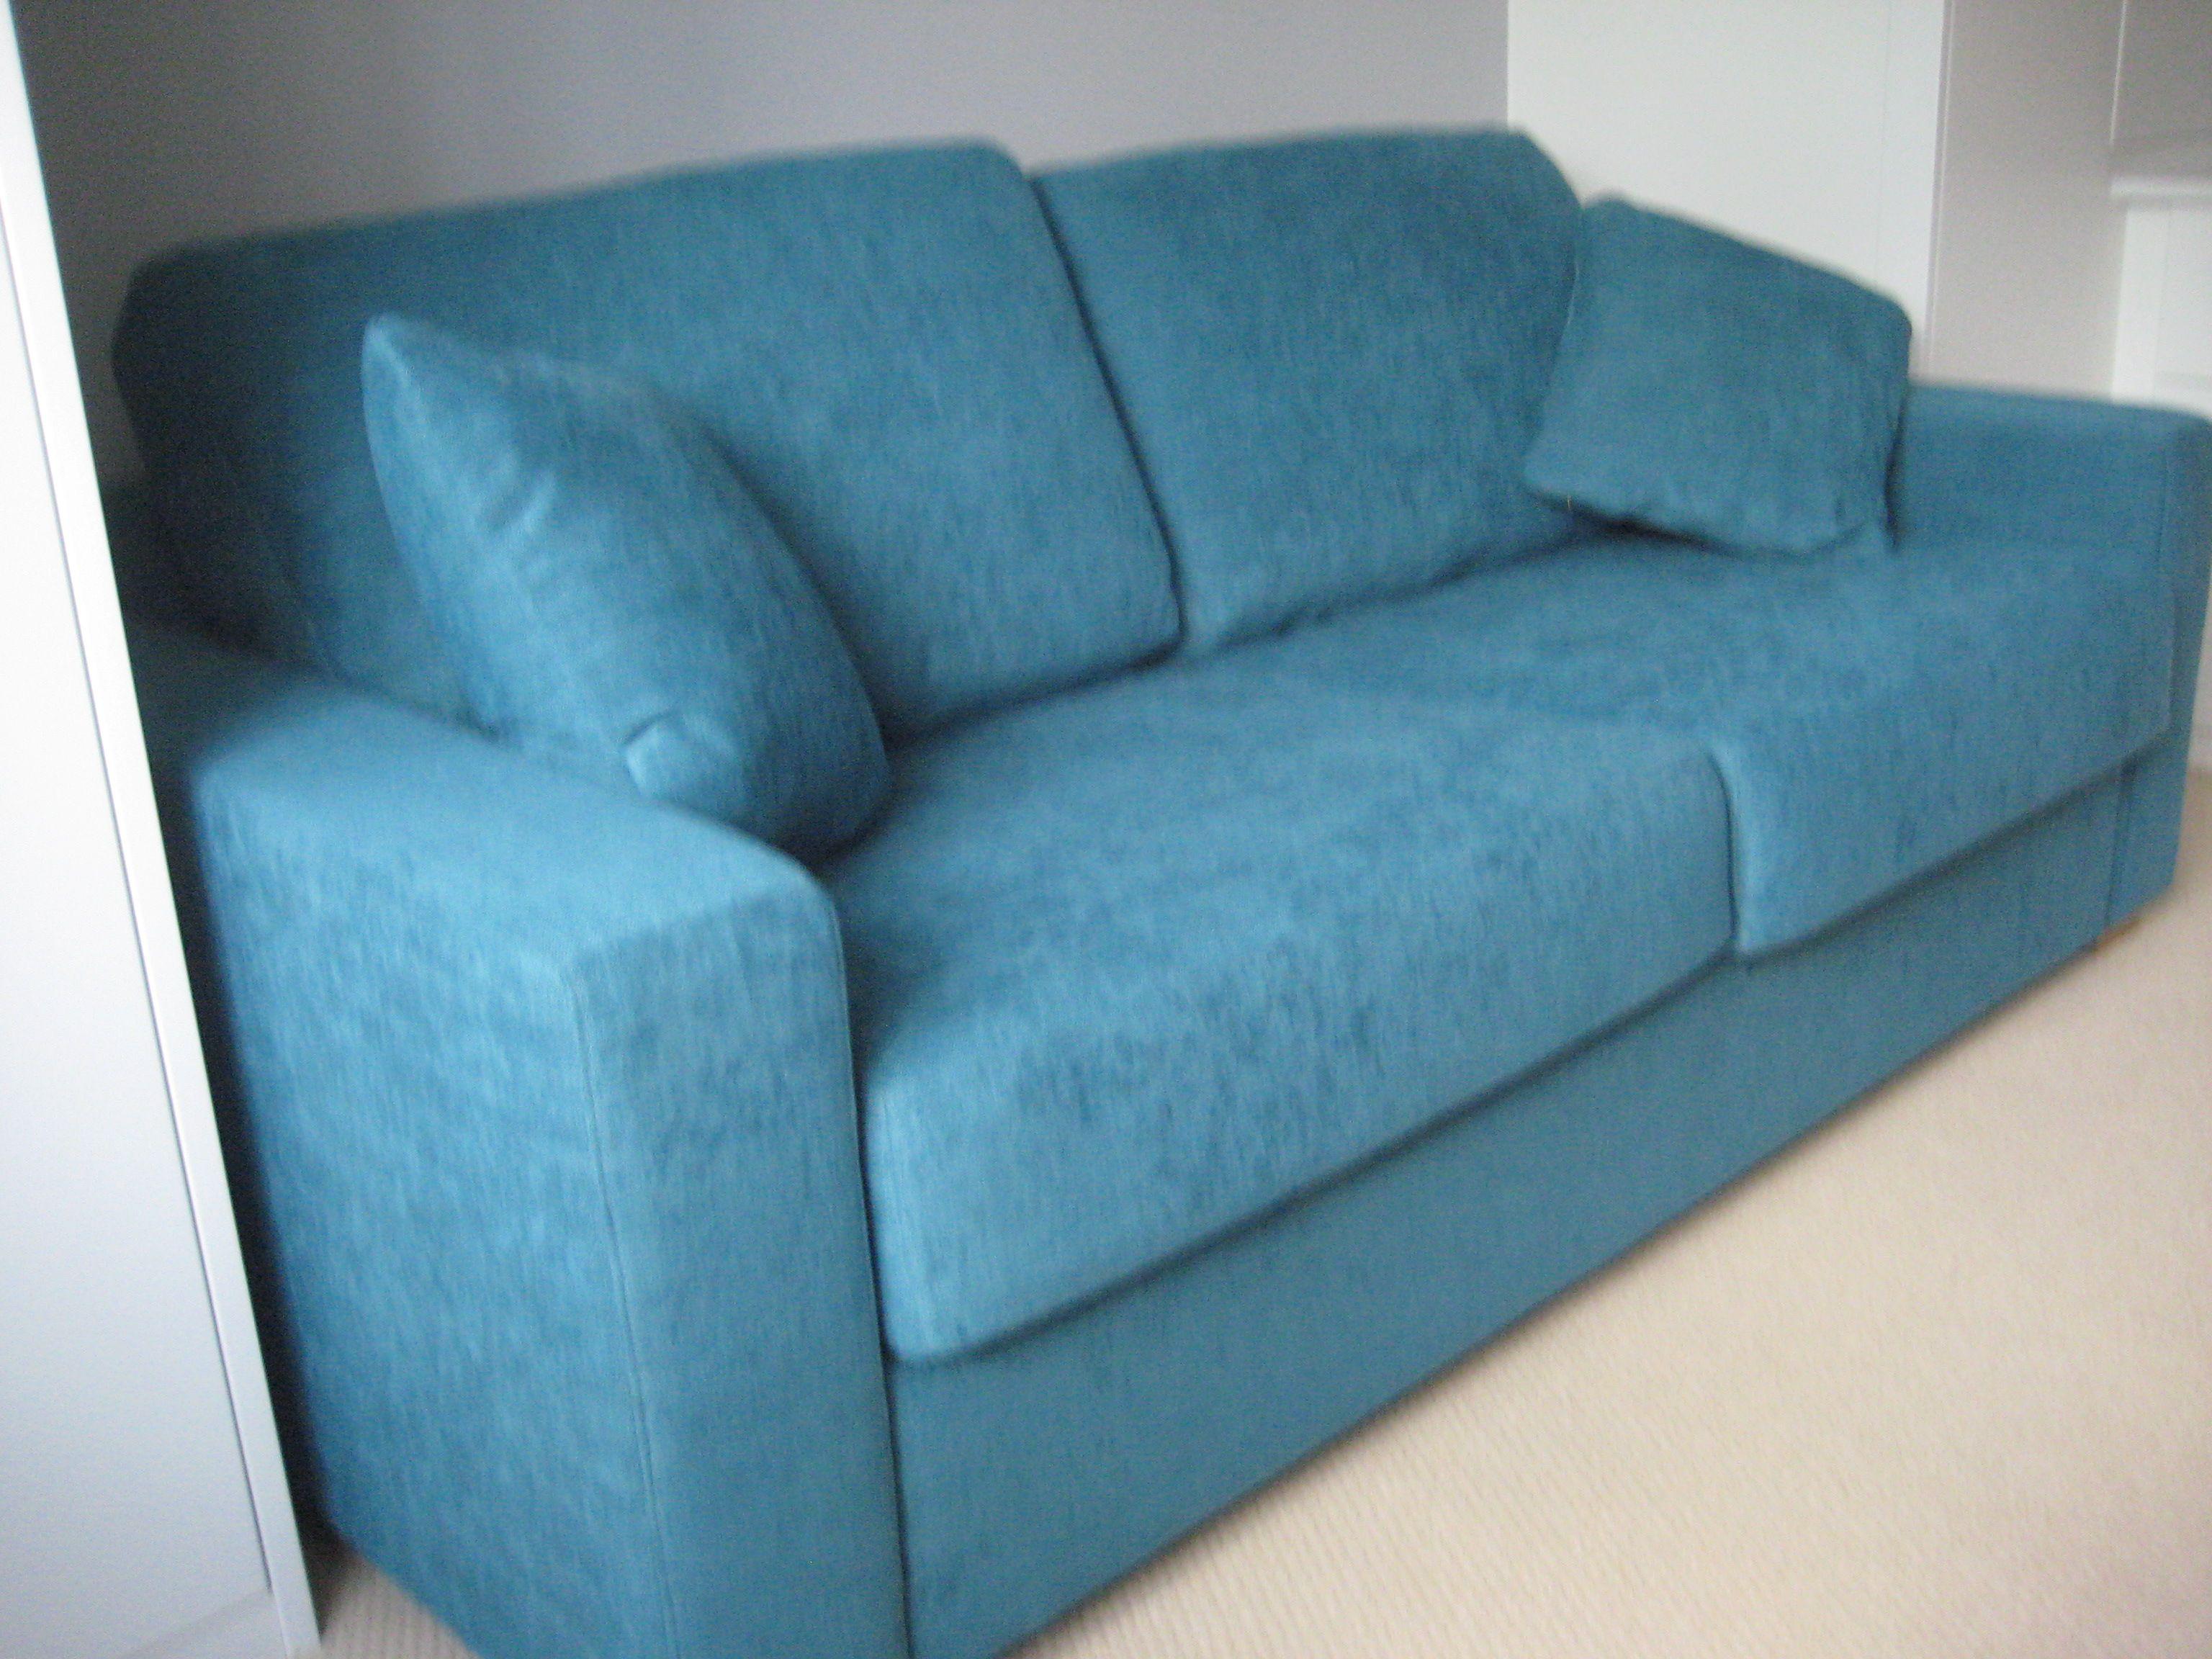 66 inch wide sofa grey velvet chesterfield australia double bed 186 cm with 140 x 195 regular